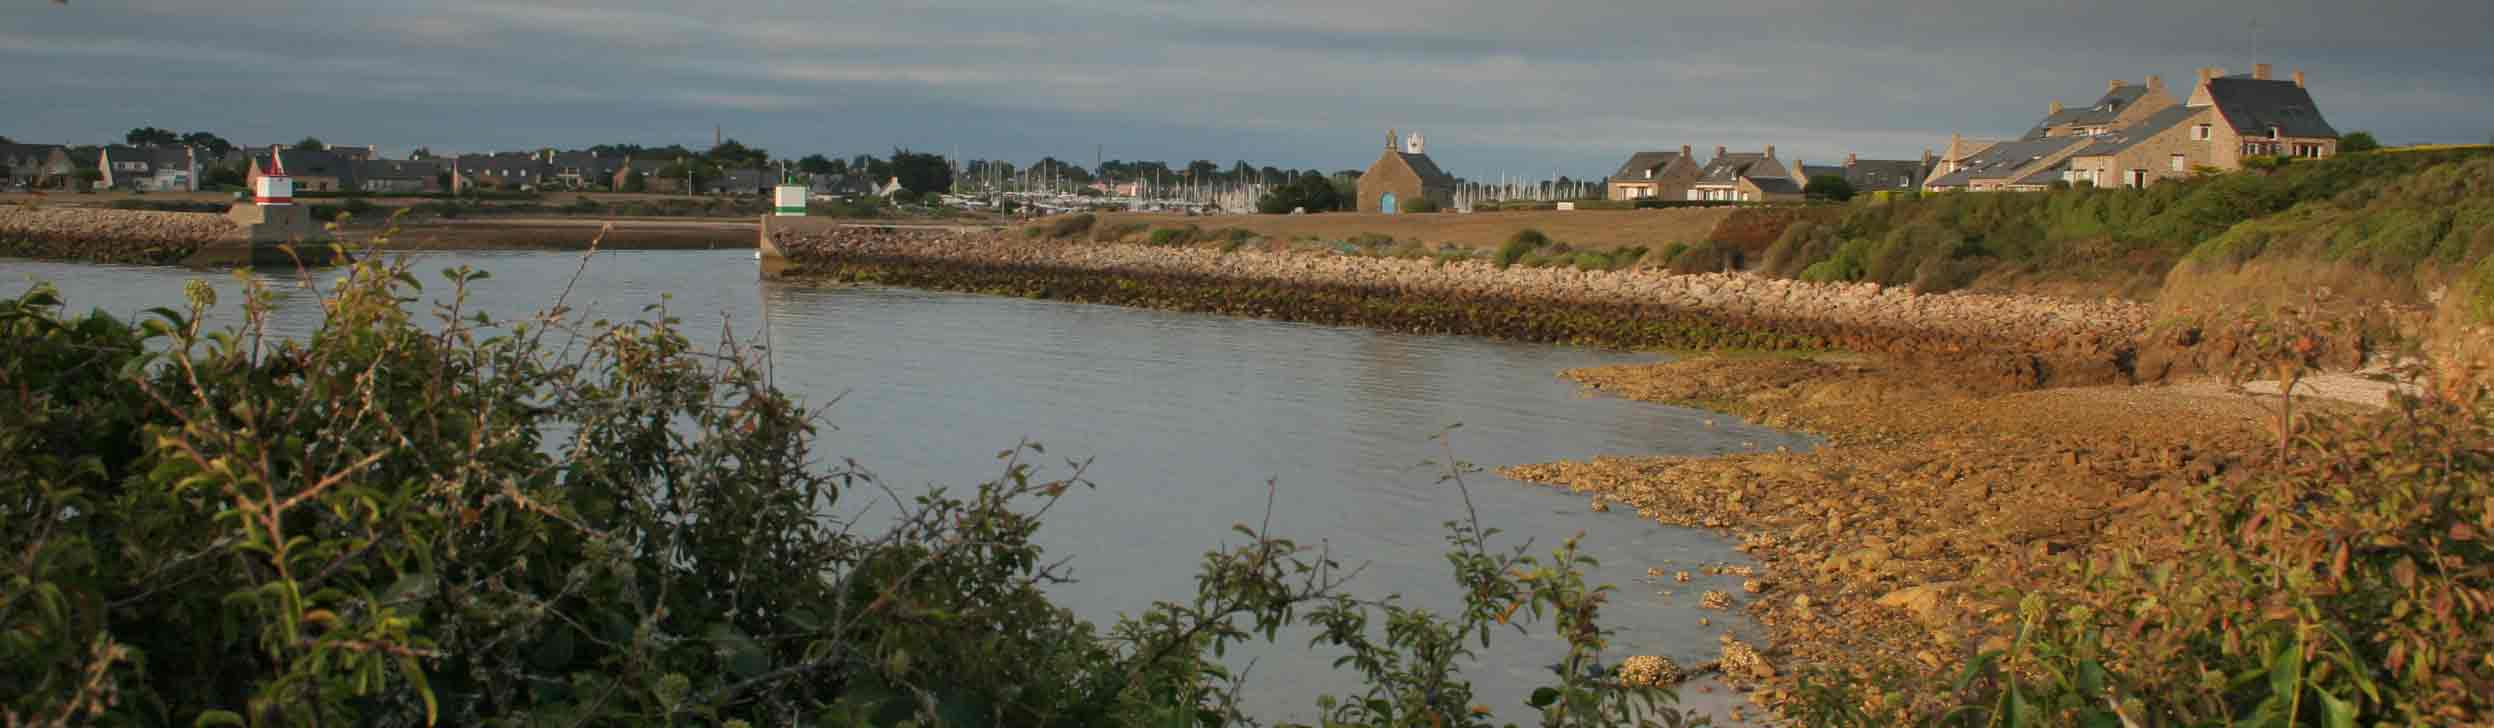 visite port du crouesty en morbihan